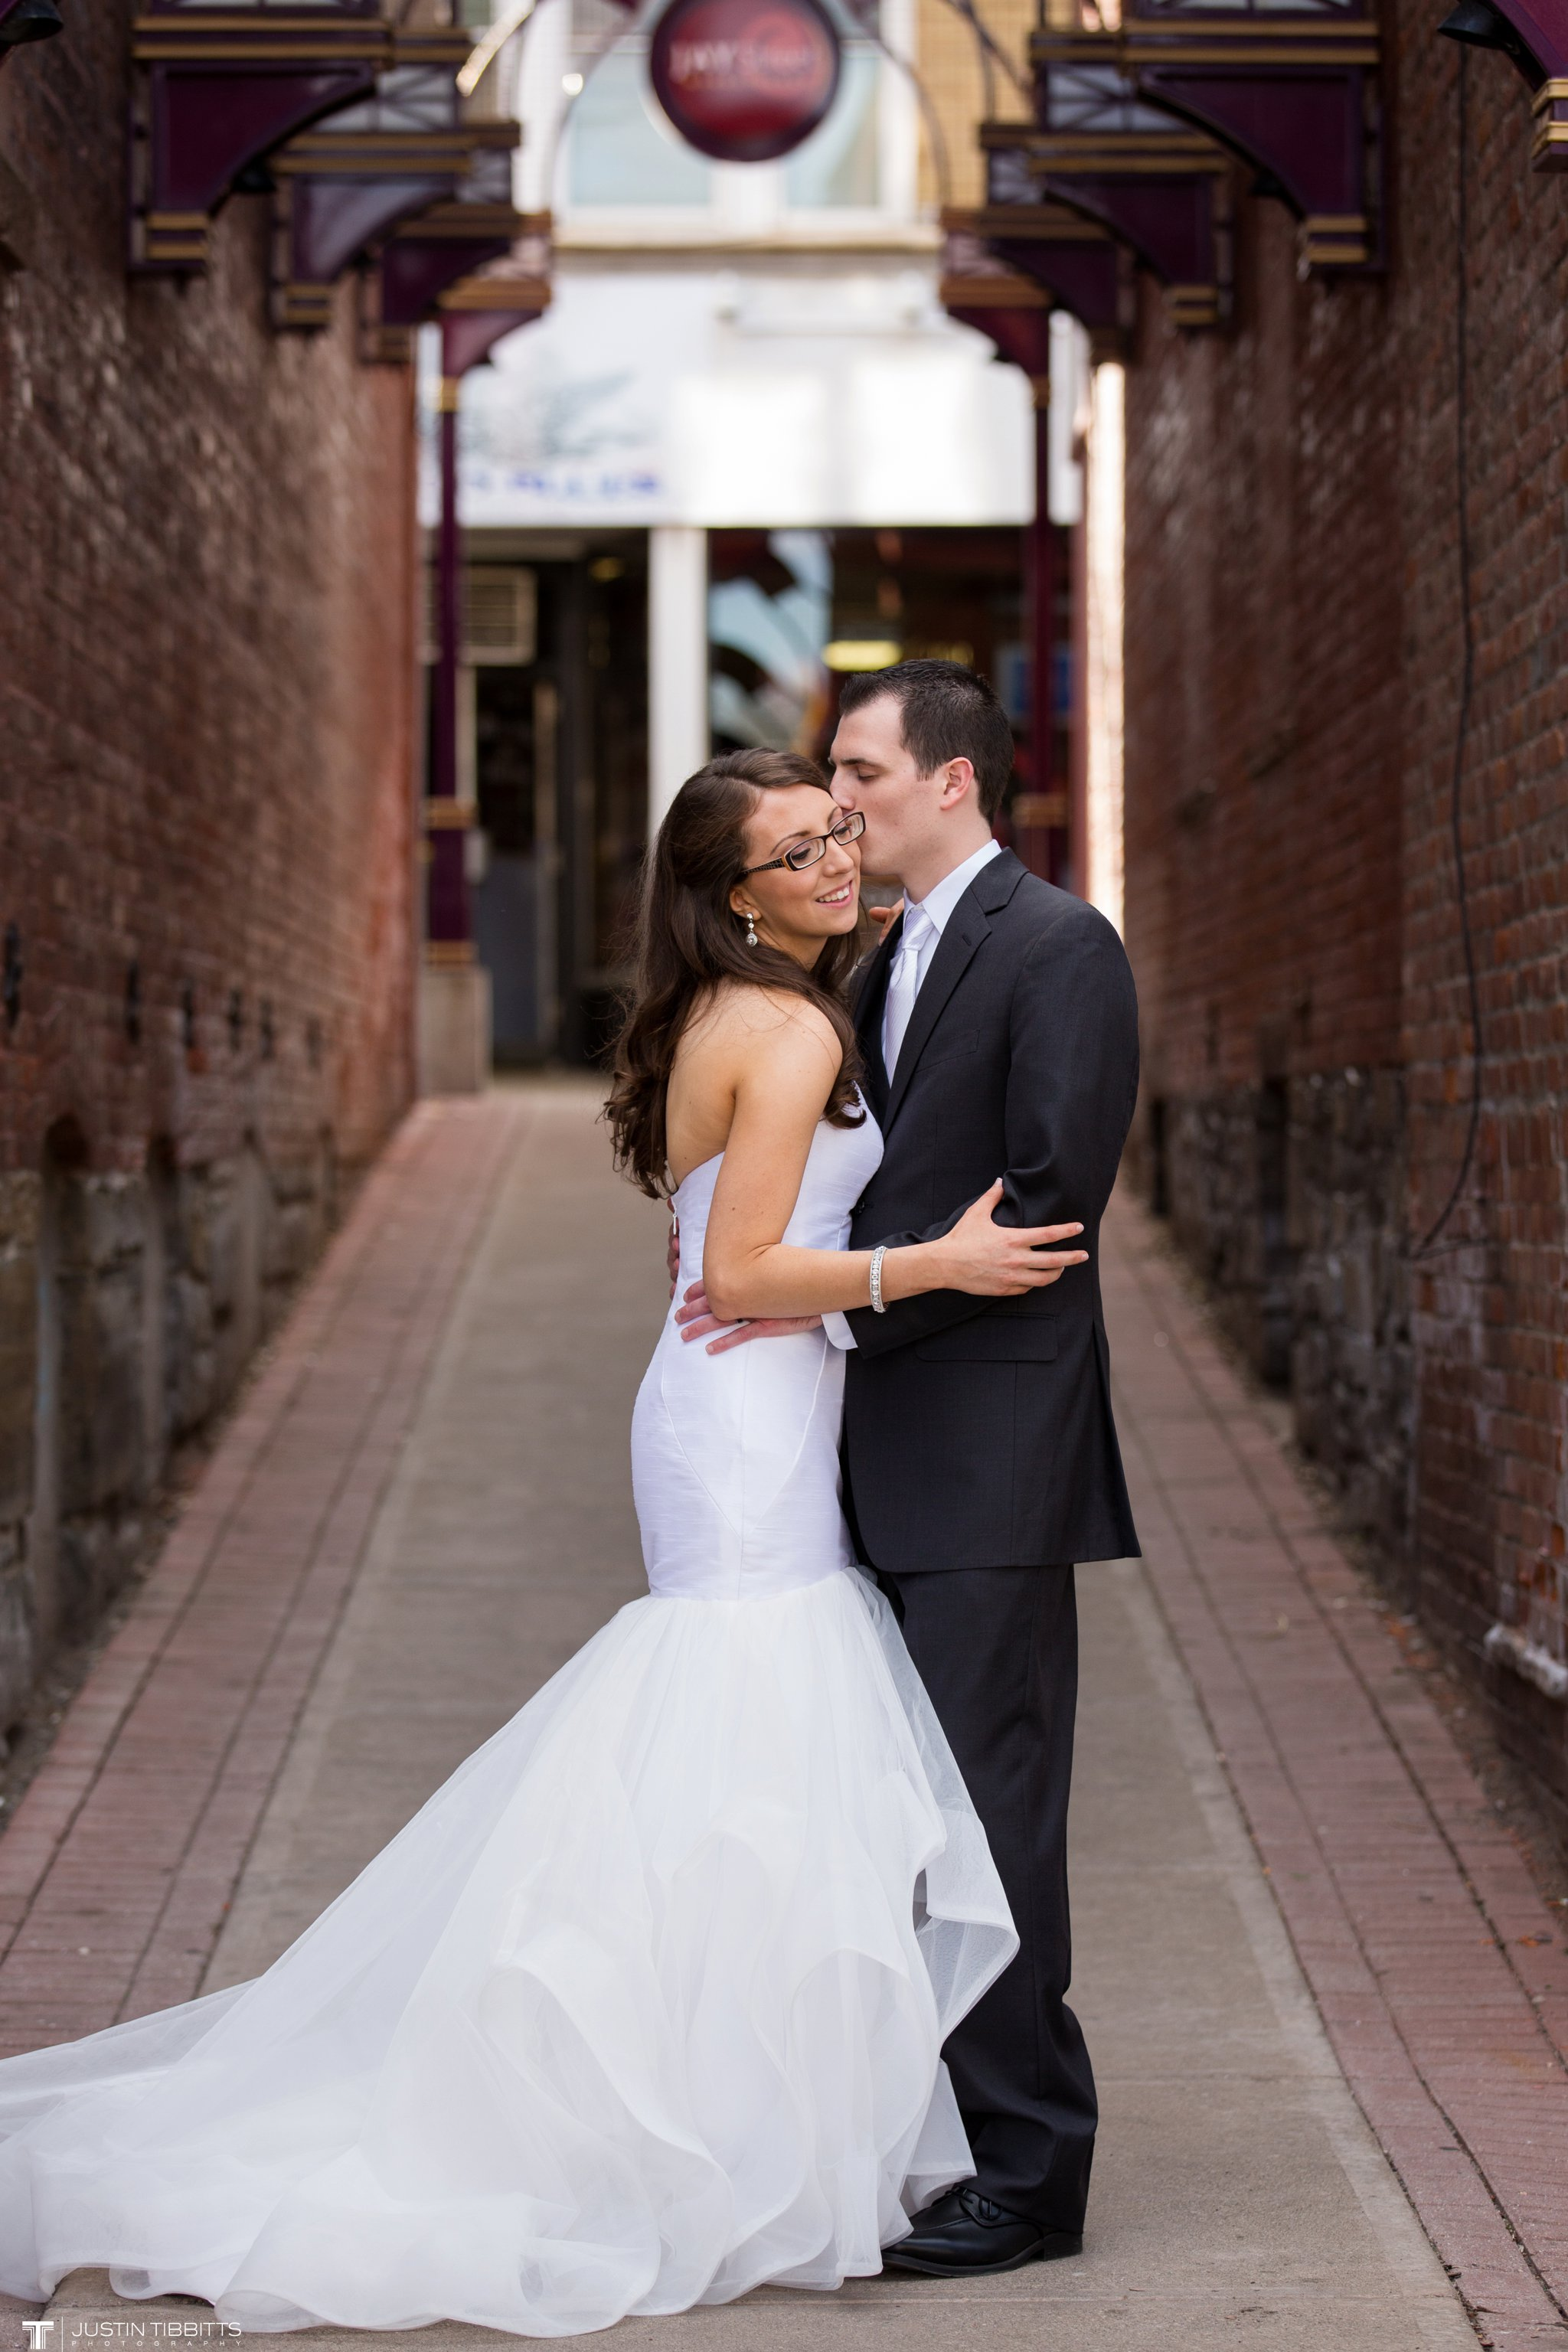 Antonia and Nicks Key Hall at Proctors Wedding Photos_0125